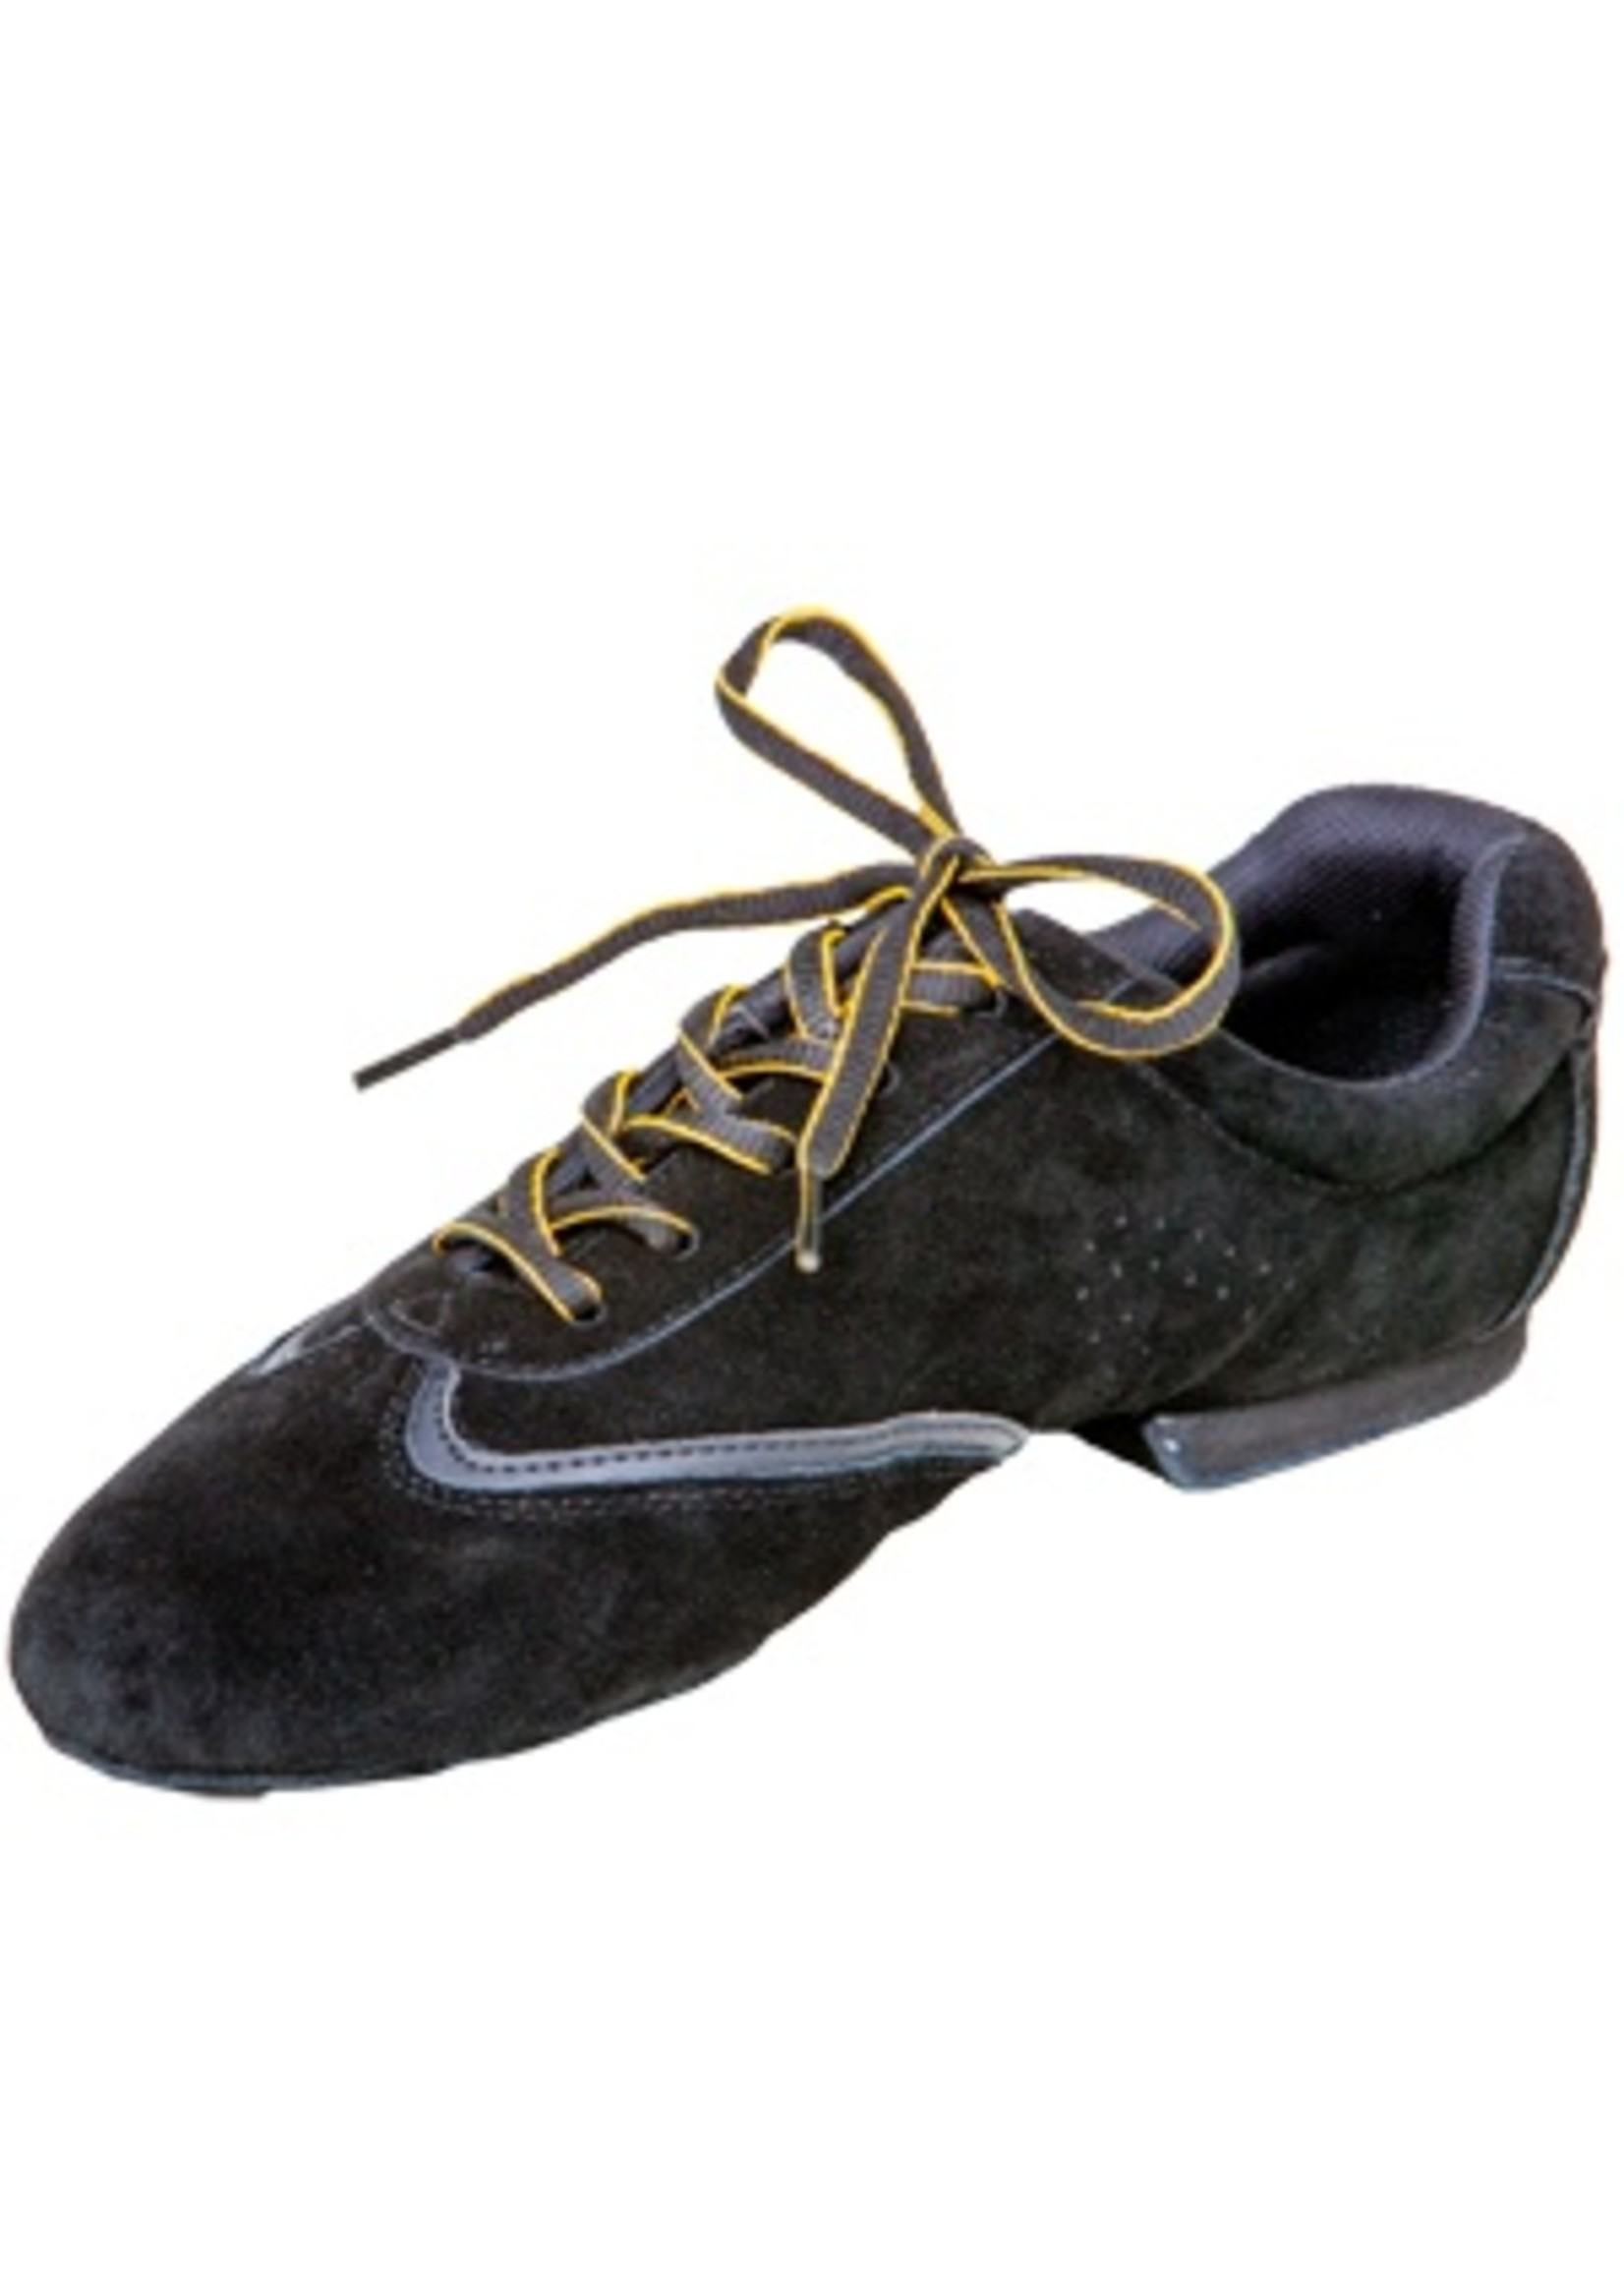 GoGo Dance/Stephanie Espadrilles (sneakers) - Stephanie Shoes - 11004-11 DSC - Pointure 6